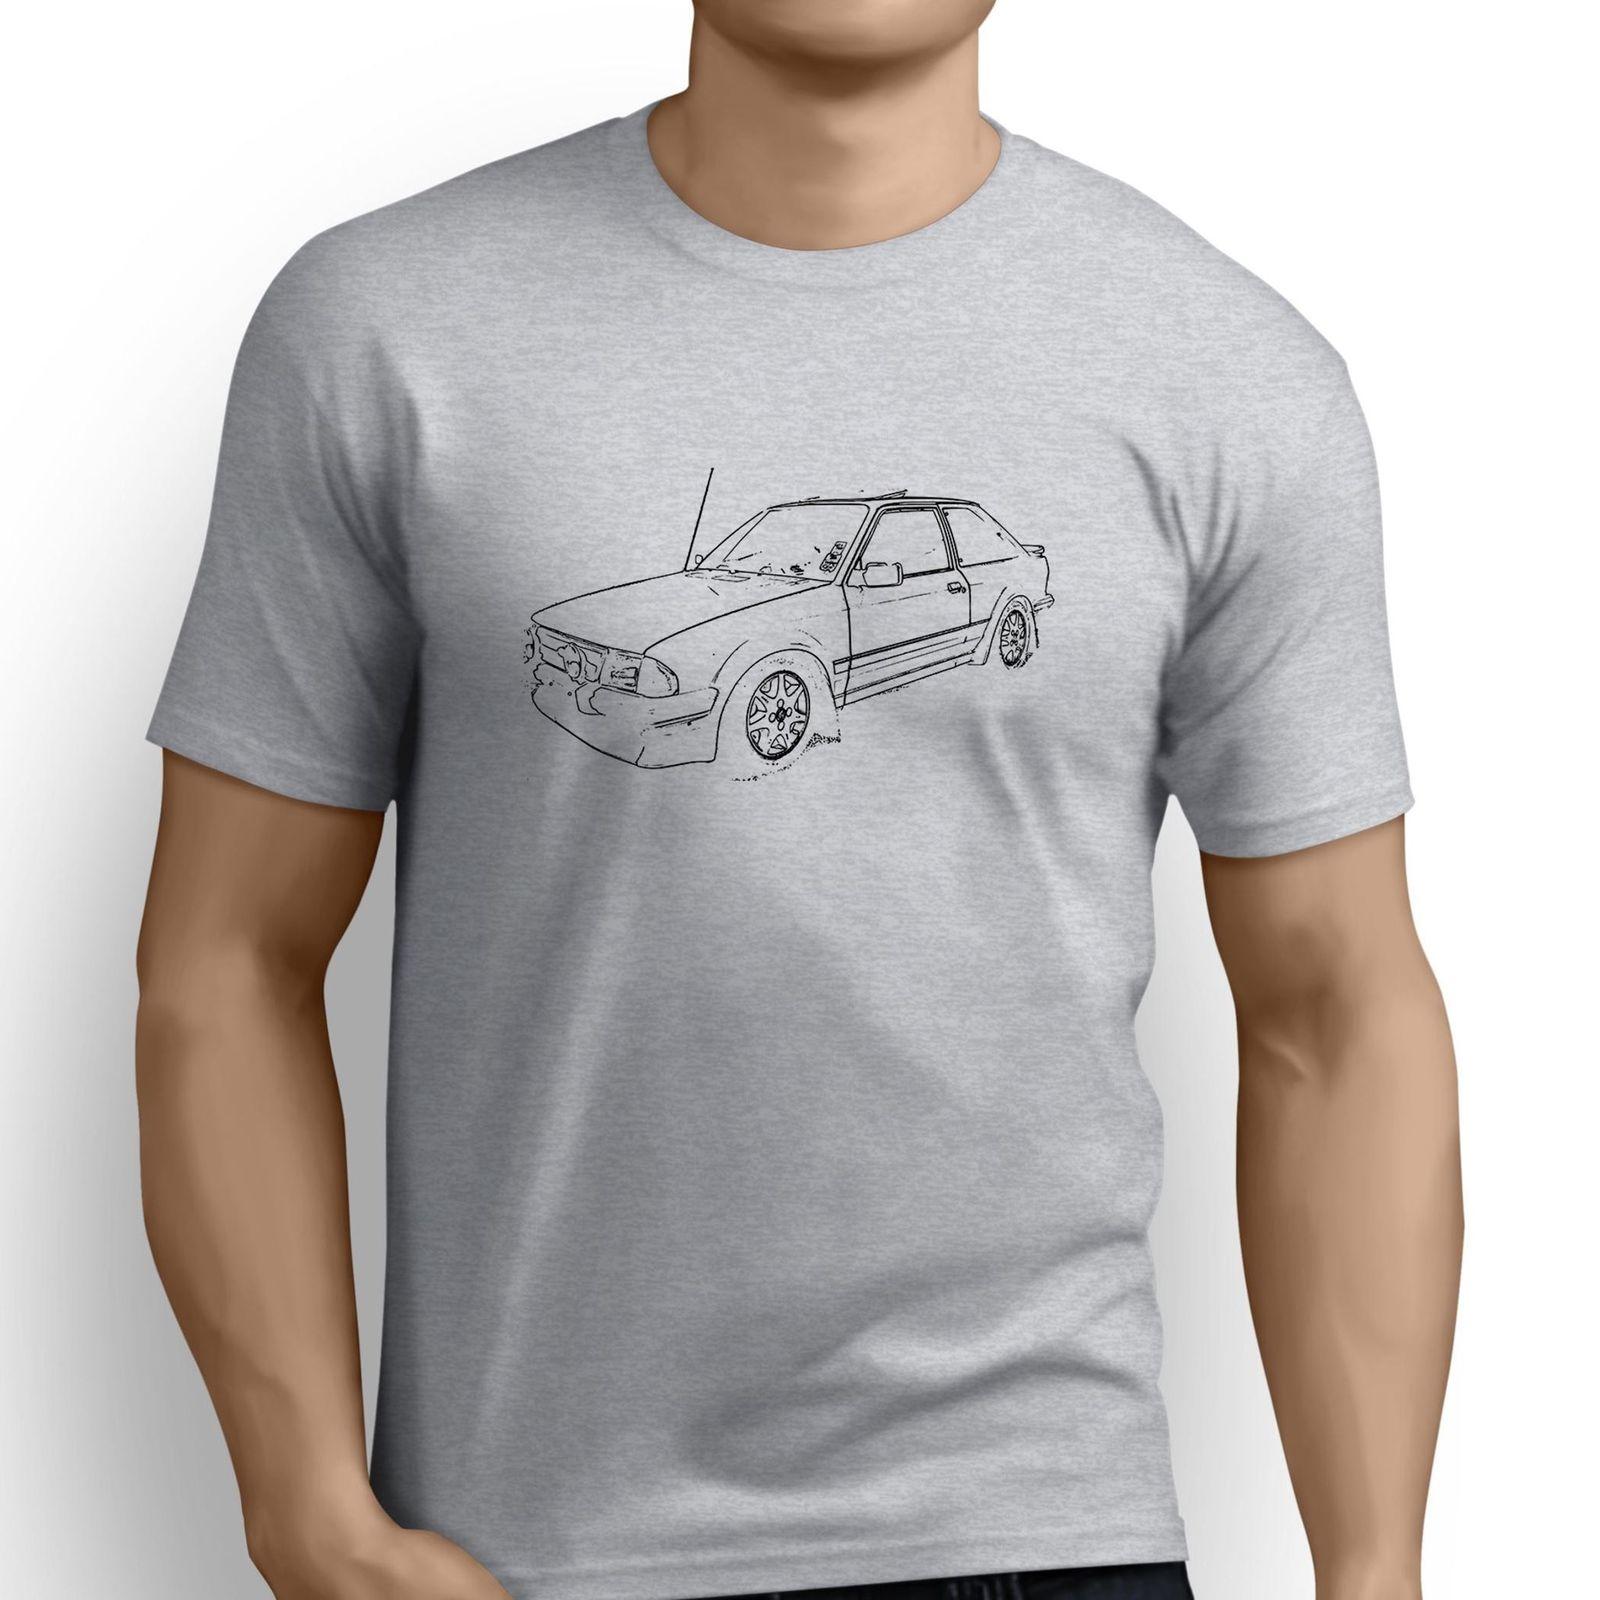 2018 New Fashion Brand Print T-Shirt Male Brand American Car Fans Escort Rs Turbo Inspiredsilk Screen T Shirts